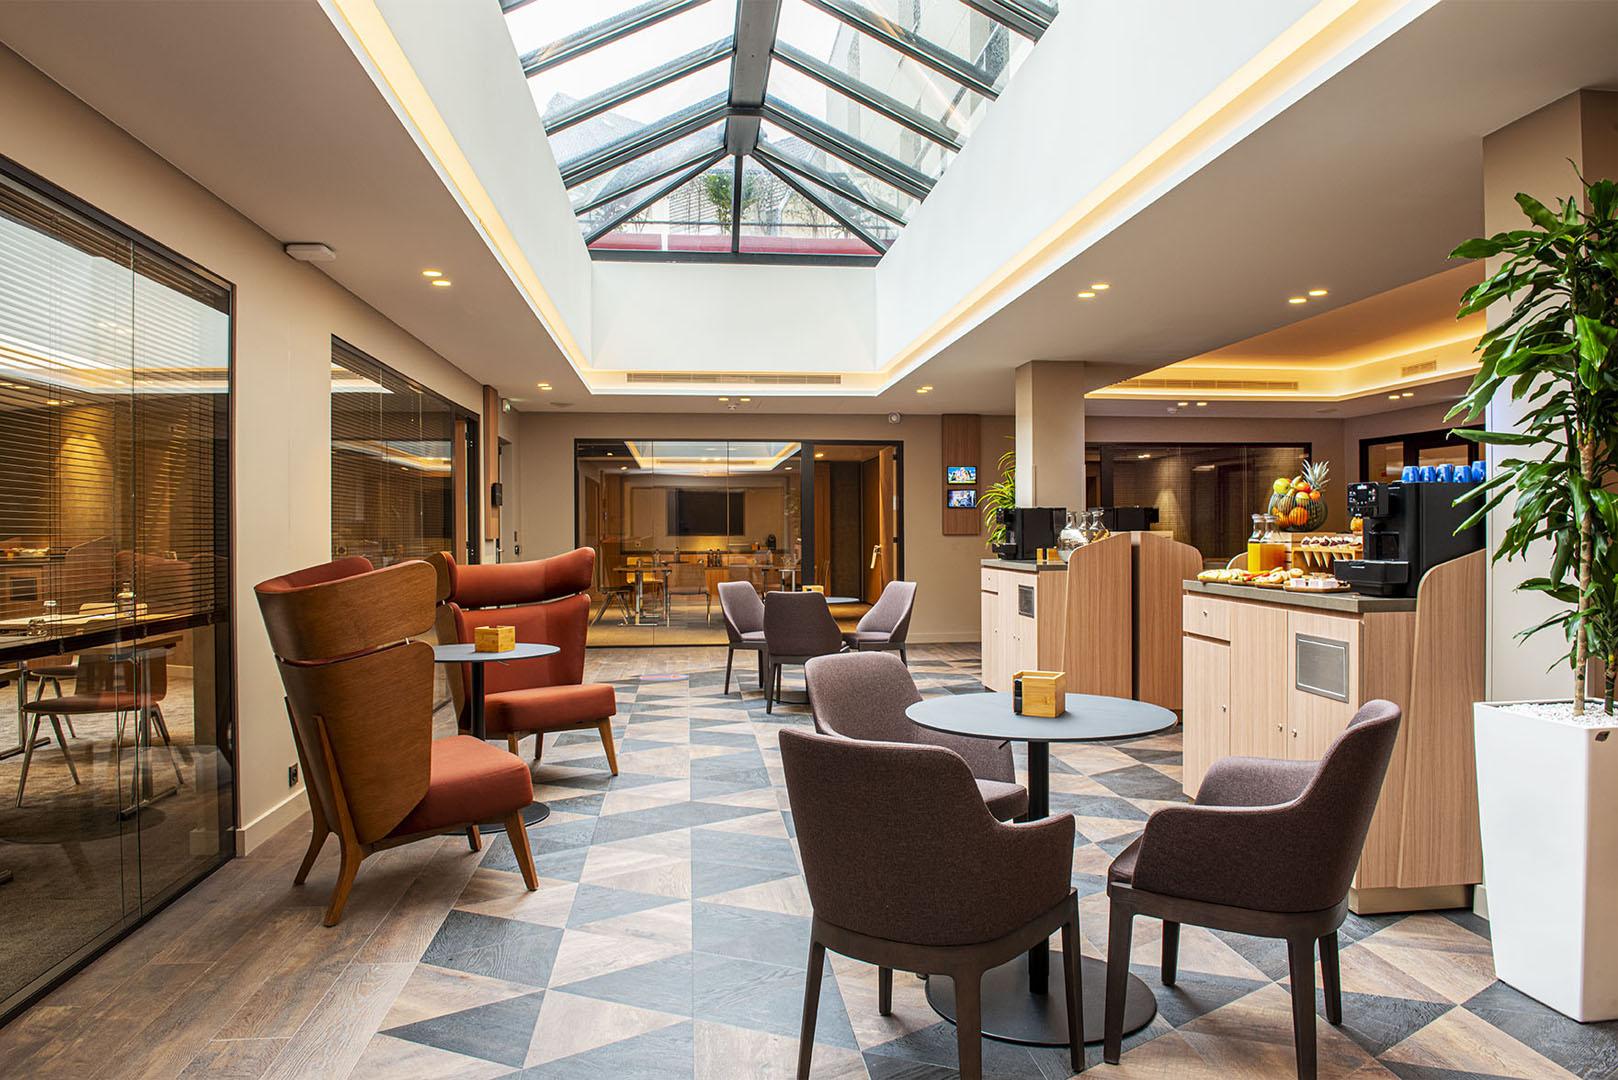 hotel-du-donjon-cba-rouen-francisvauban-5